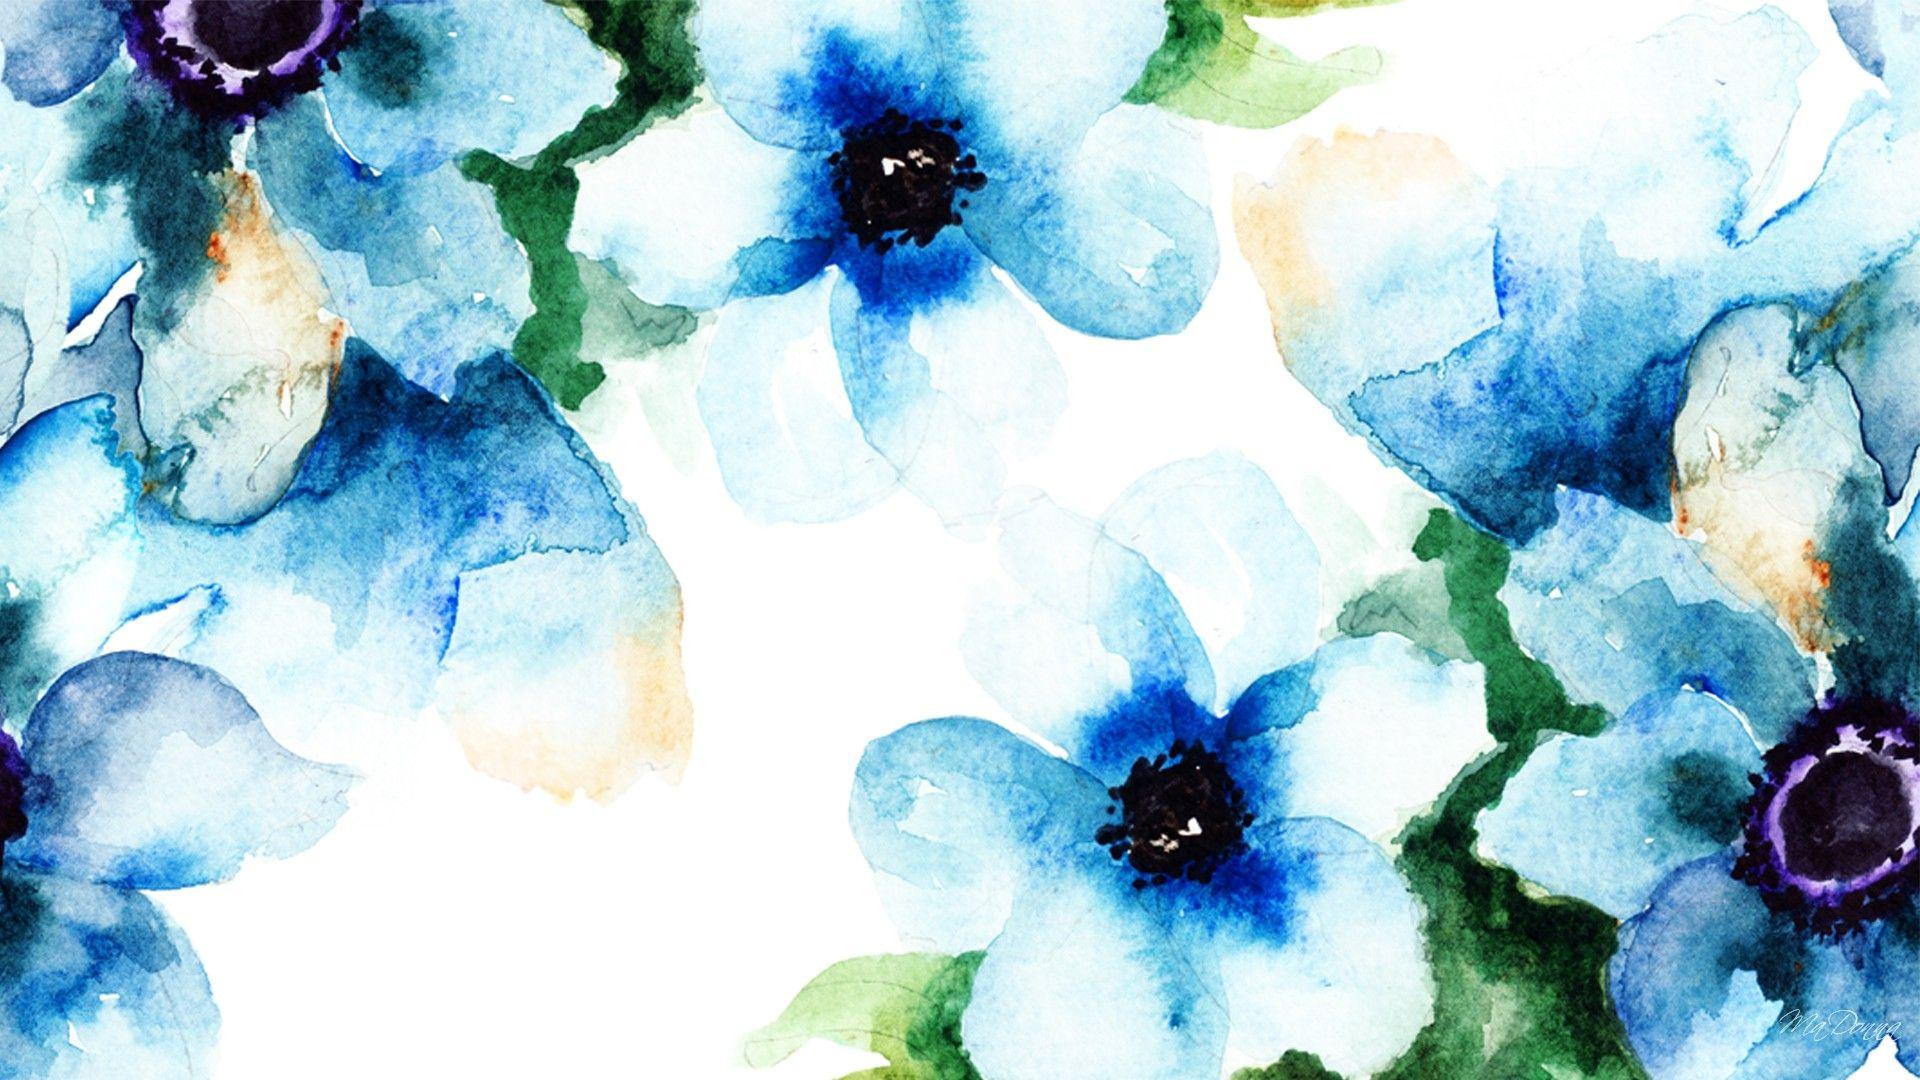 Watercolor Floral Blues HD Desktop Background wallpaper free